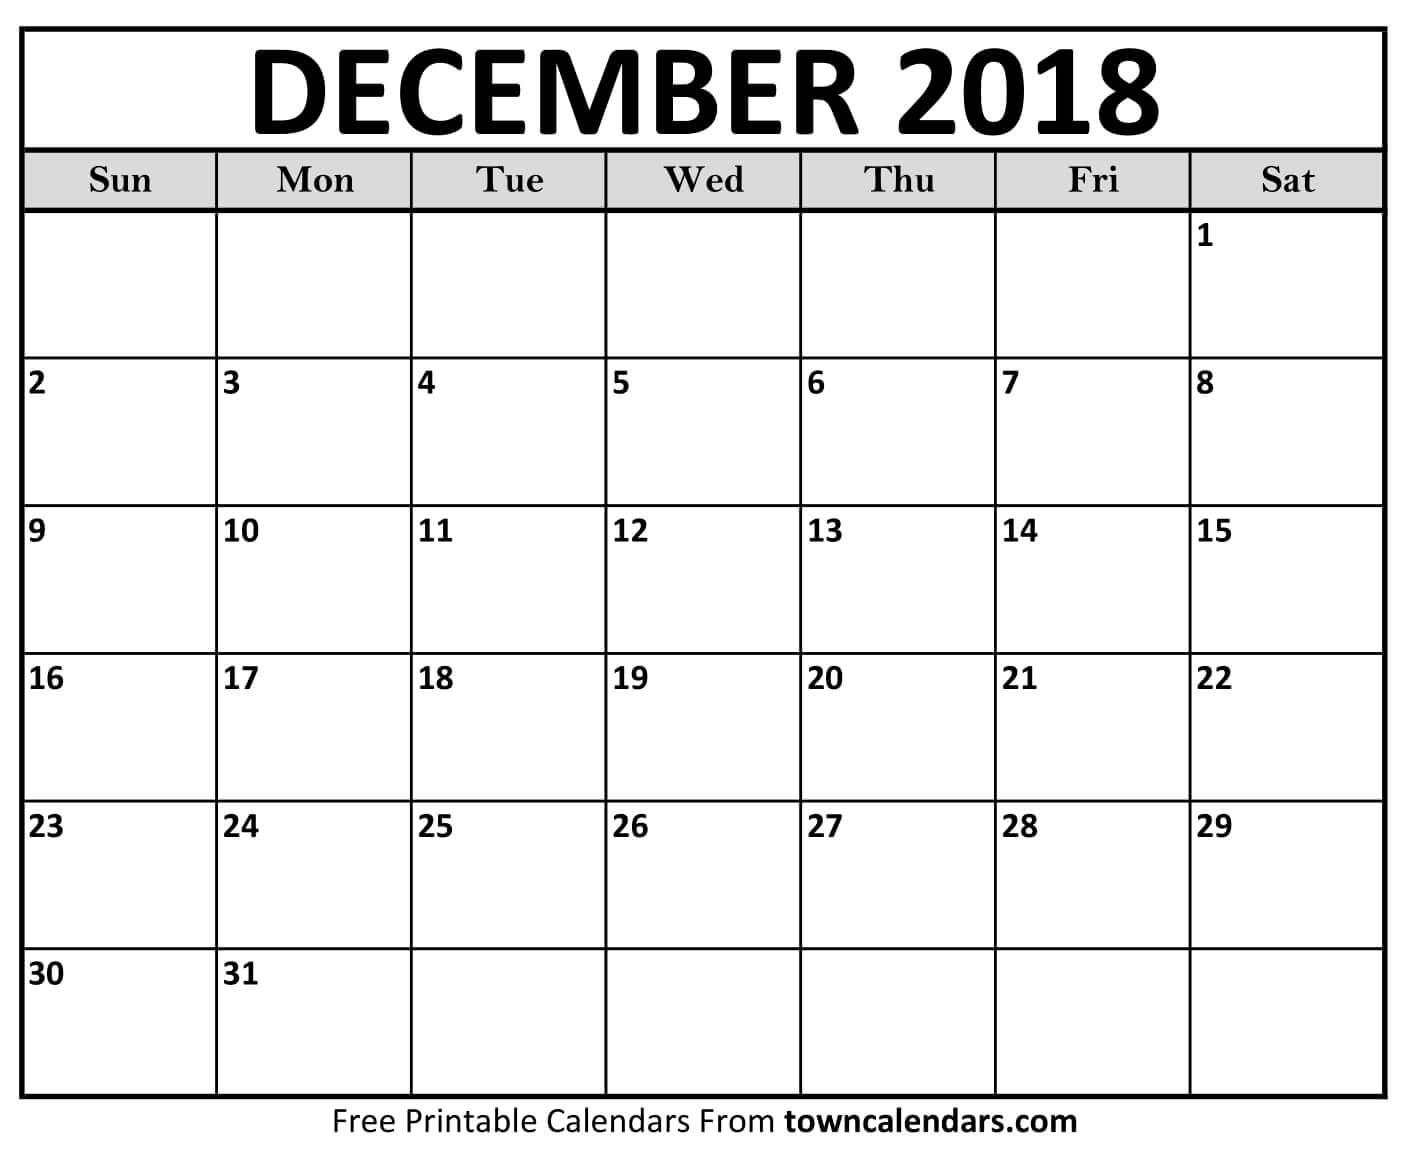 Monthly Calendar December 2018 Template Free Download within Blank Calendar Printable December Template